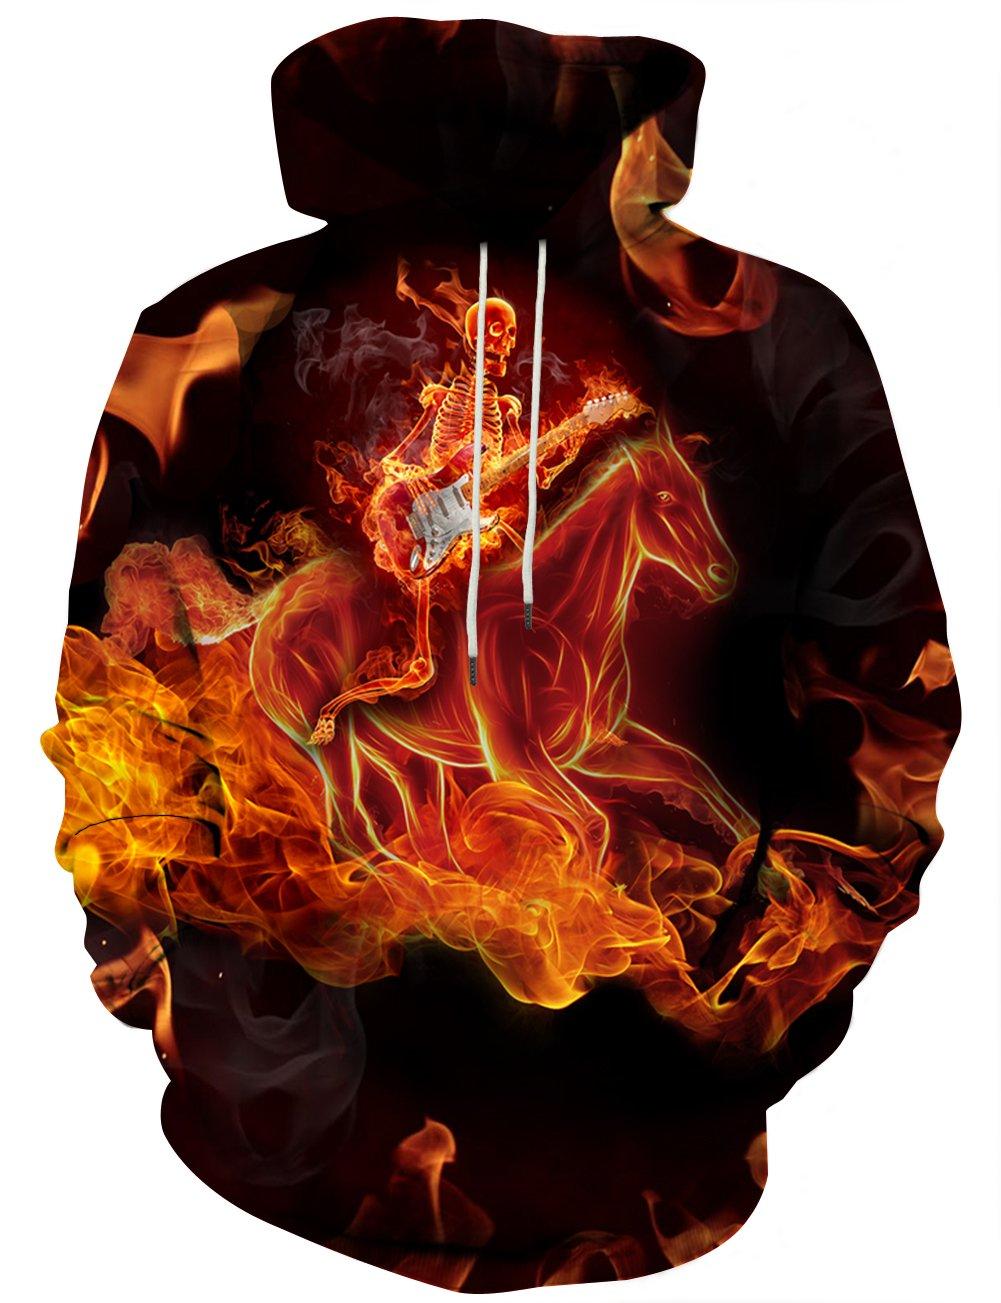 Hgvoetty Men's 3D Printed Hooded Spring/Autumn Sweatshirt Fashion Hoodies Sweatshirts XL